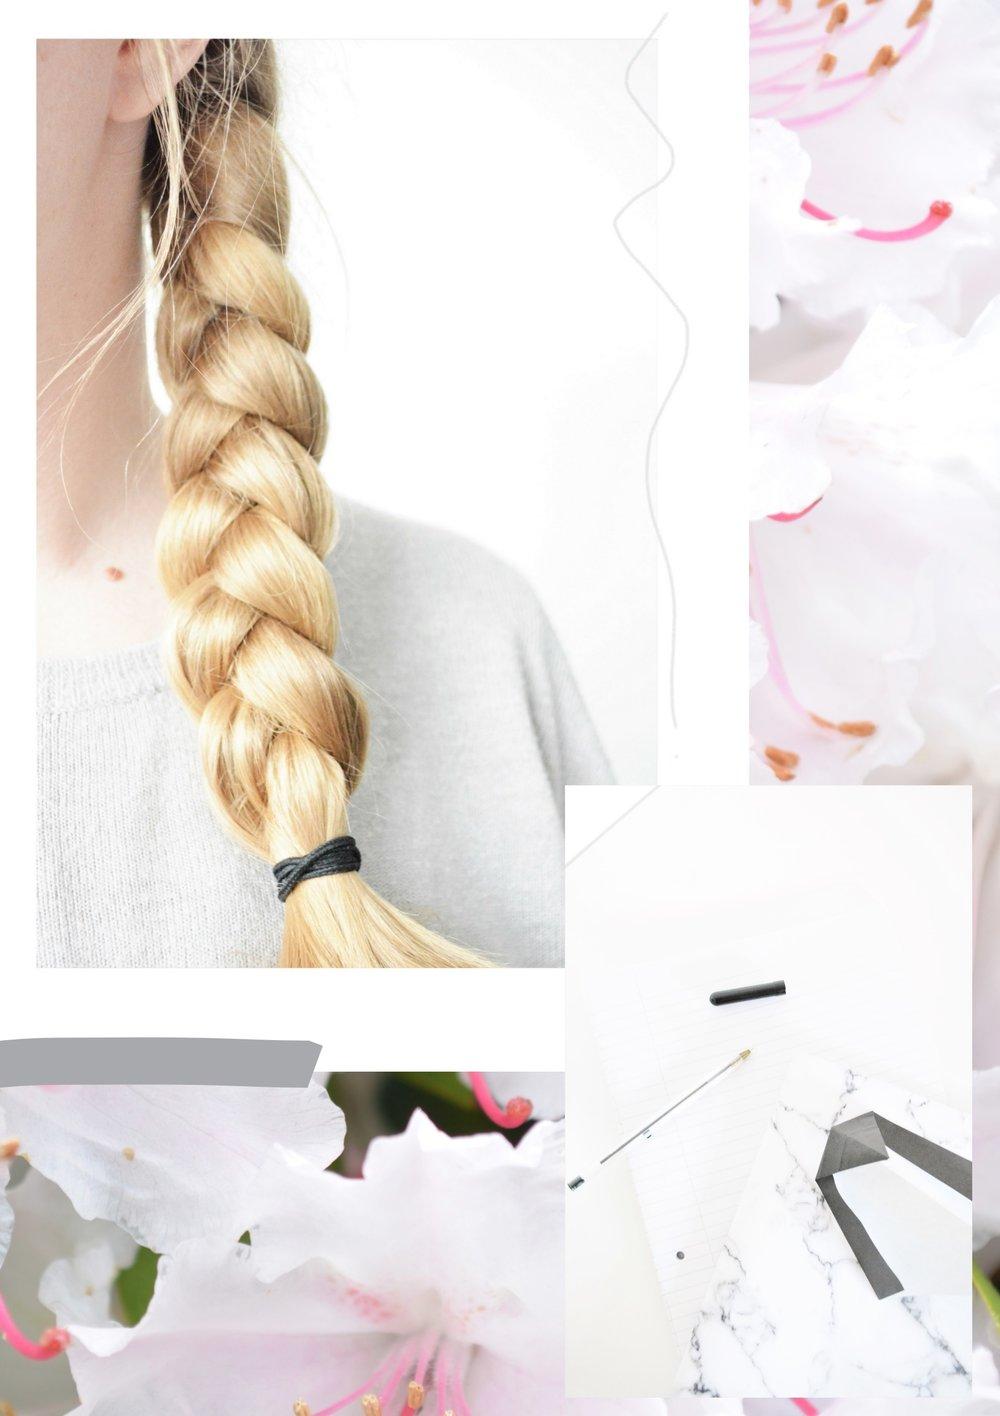 Blog Post Ideas To Explore Creativity - Lifestyle - Creativity - Photography - Blogger